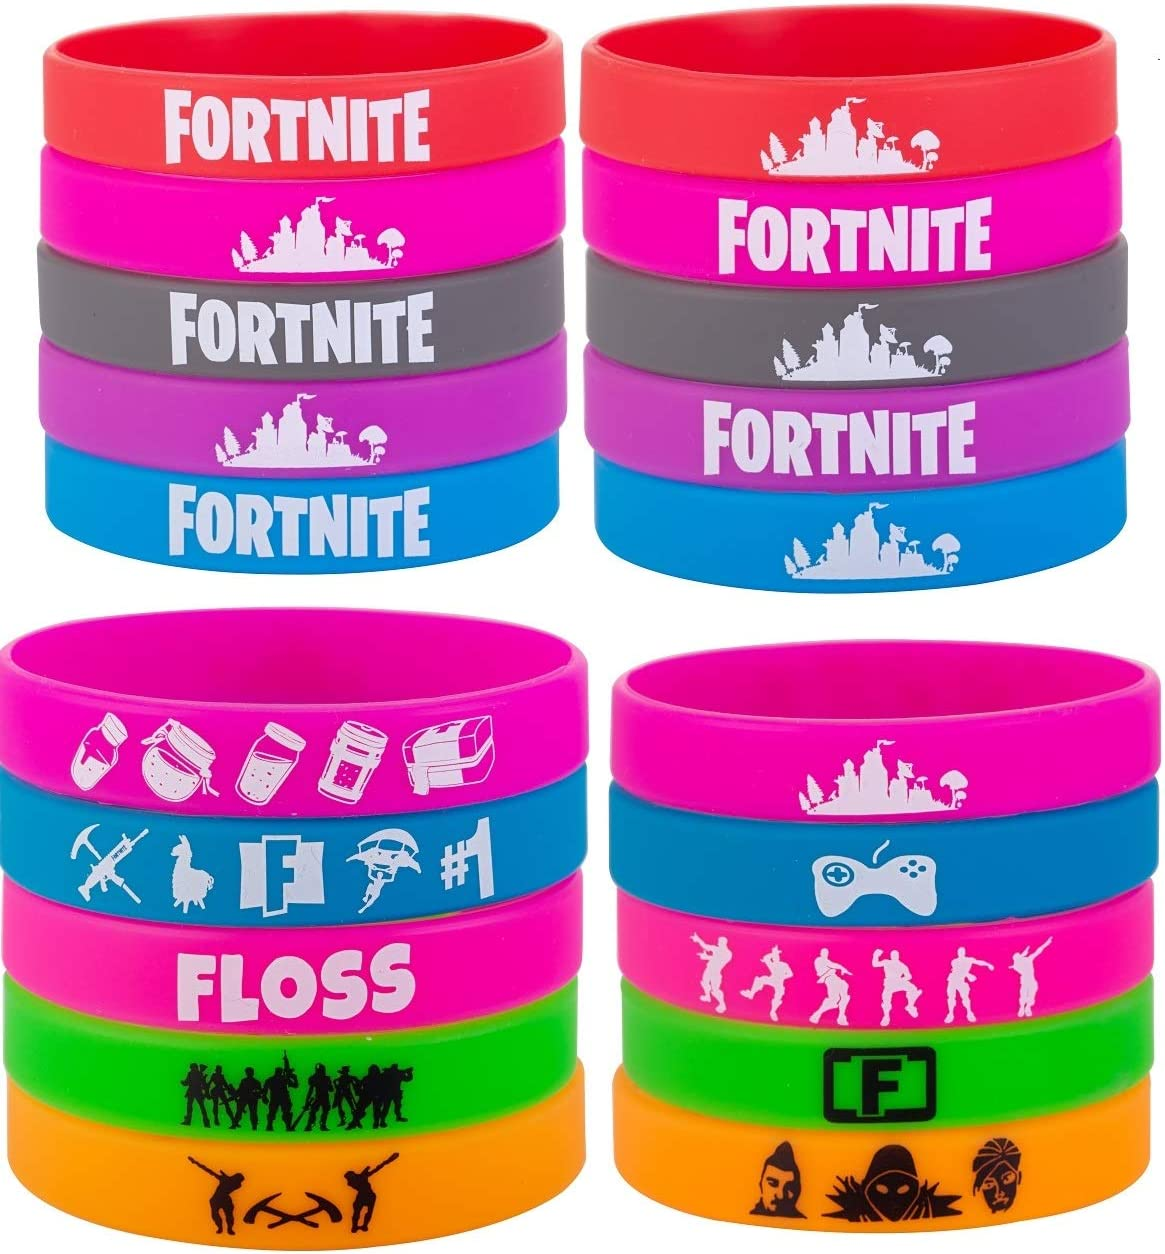 12. Fortnite Themed 30Pcs Silicone Bracelets for Kids